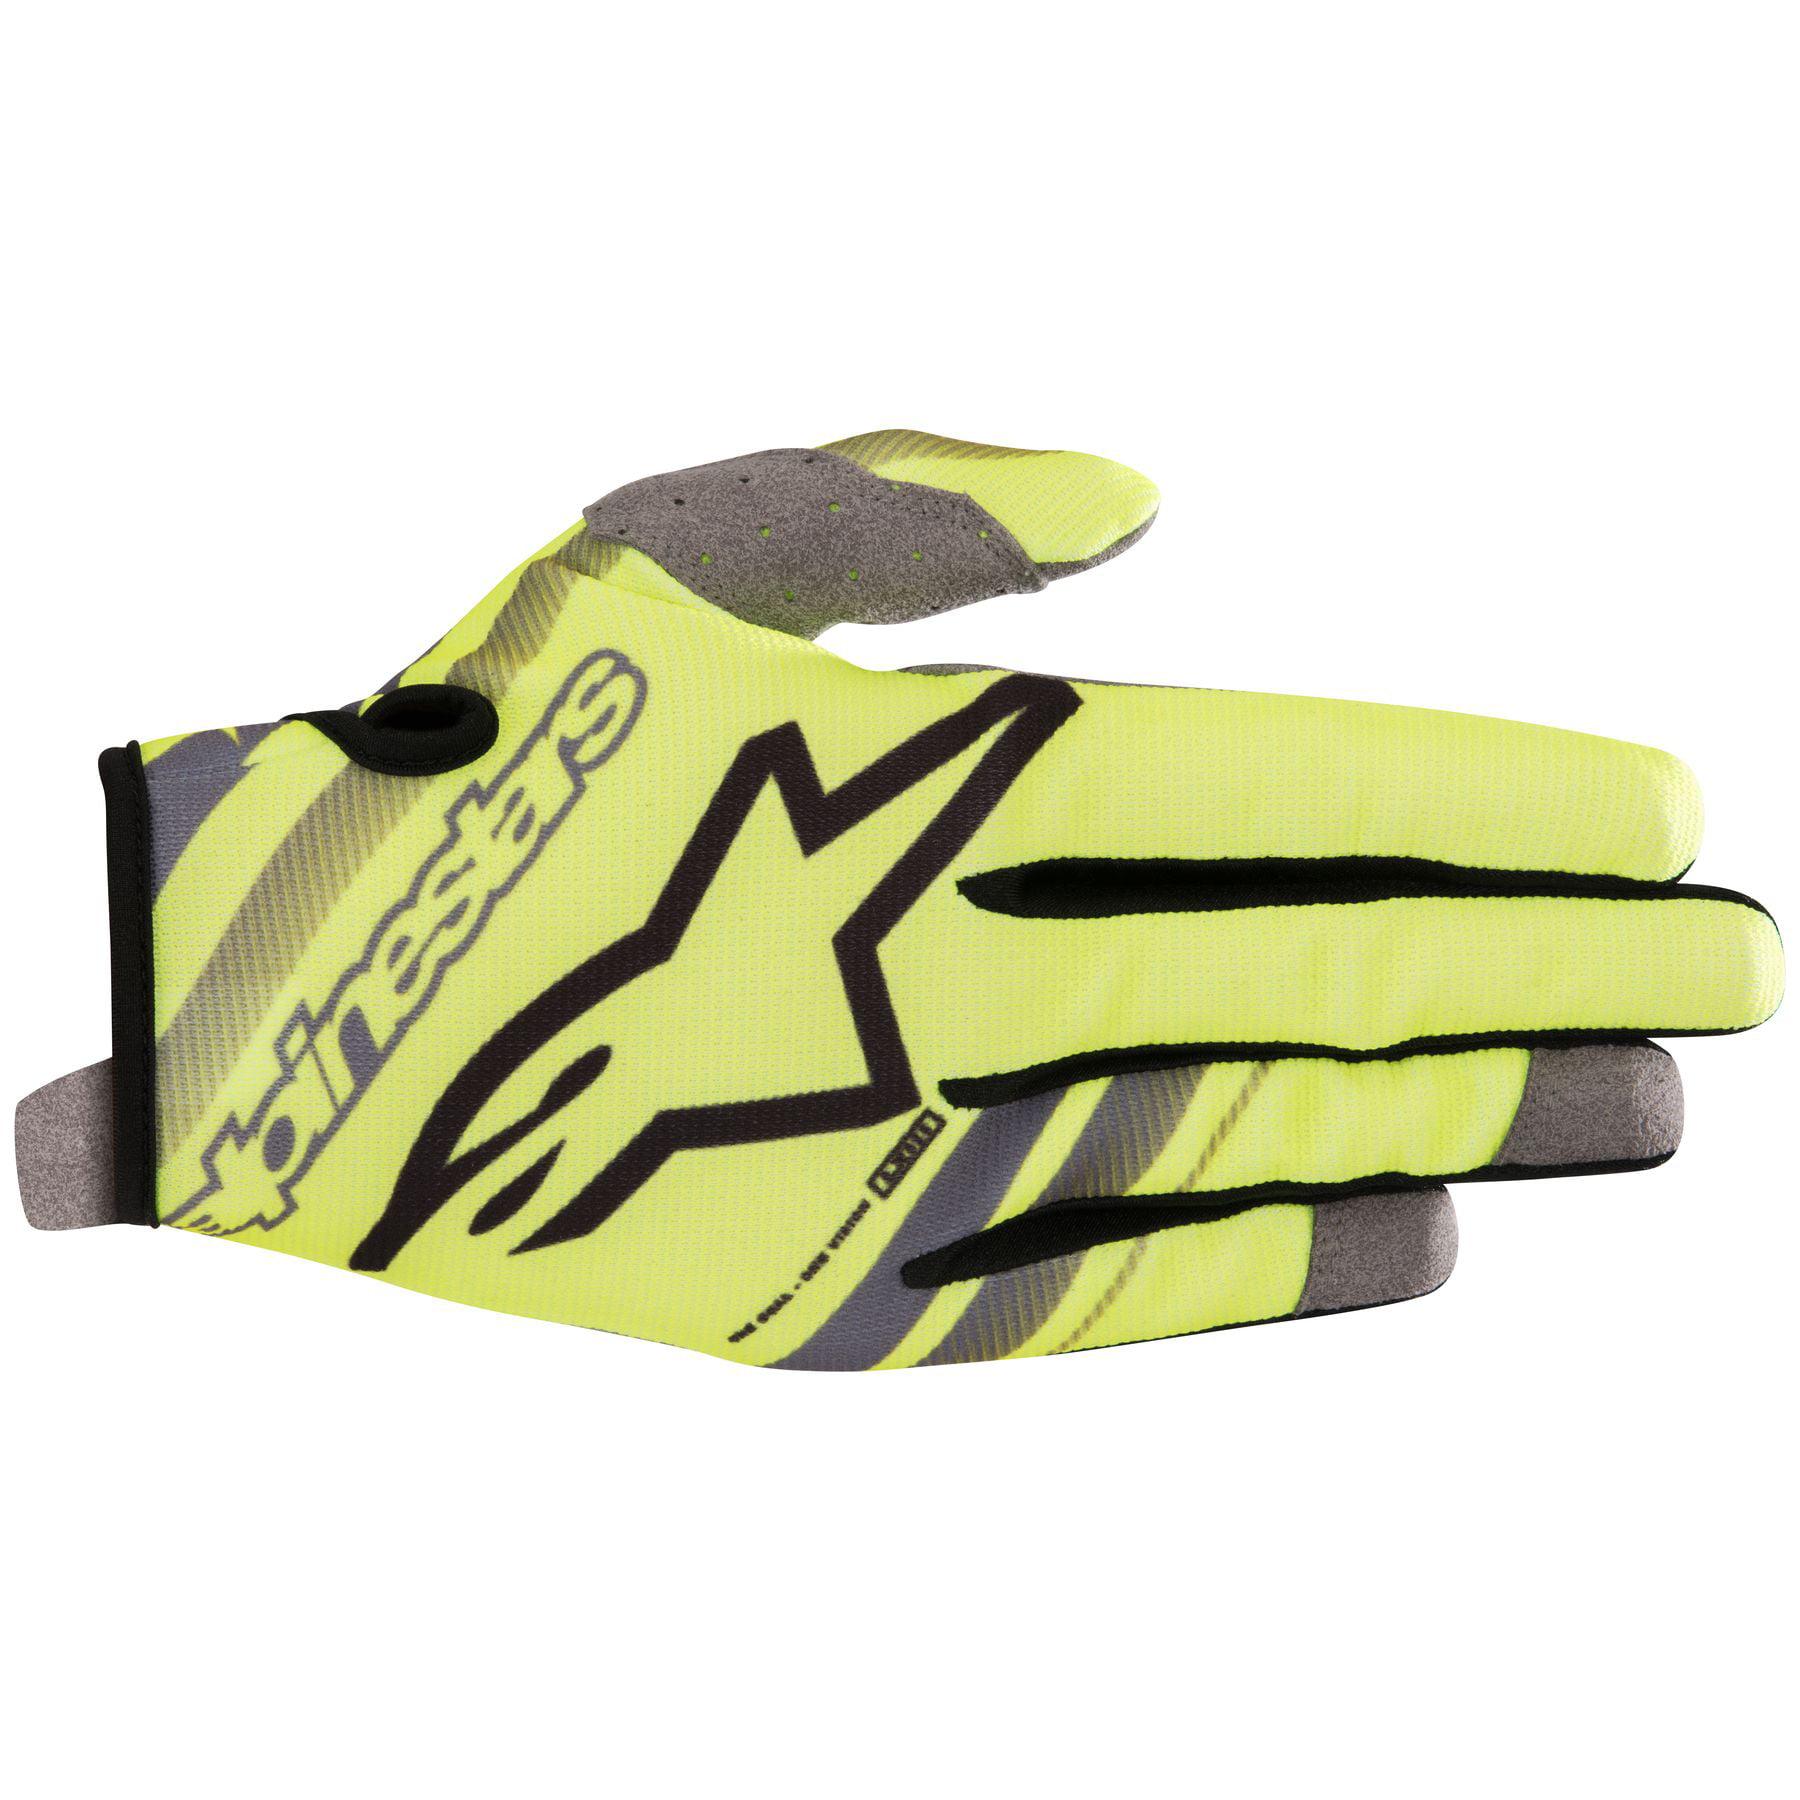 Alpinestars Radar S9 MX Offroad Gloves Yellow/Gray